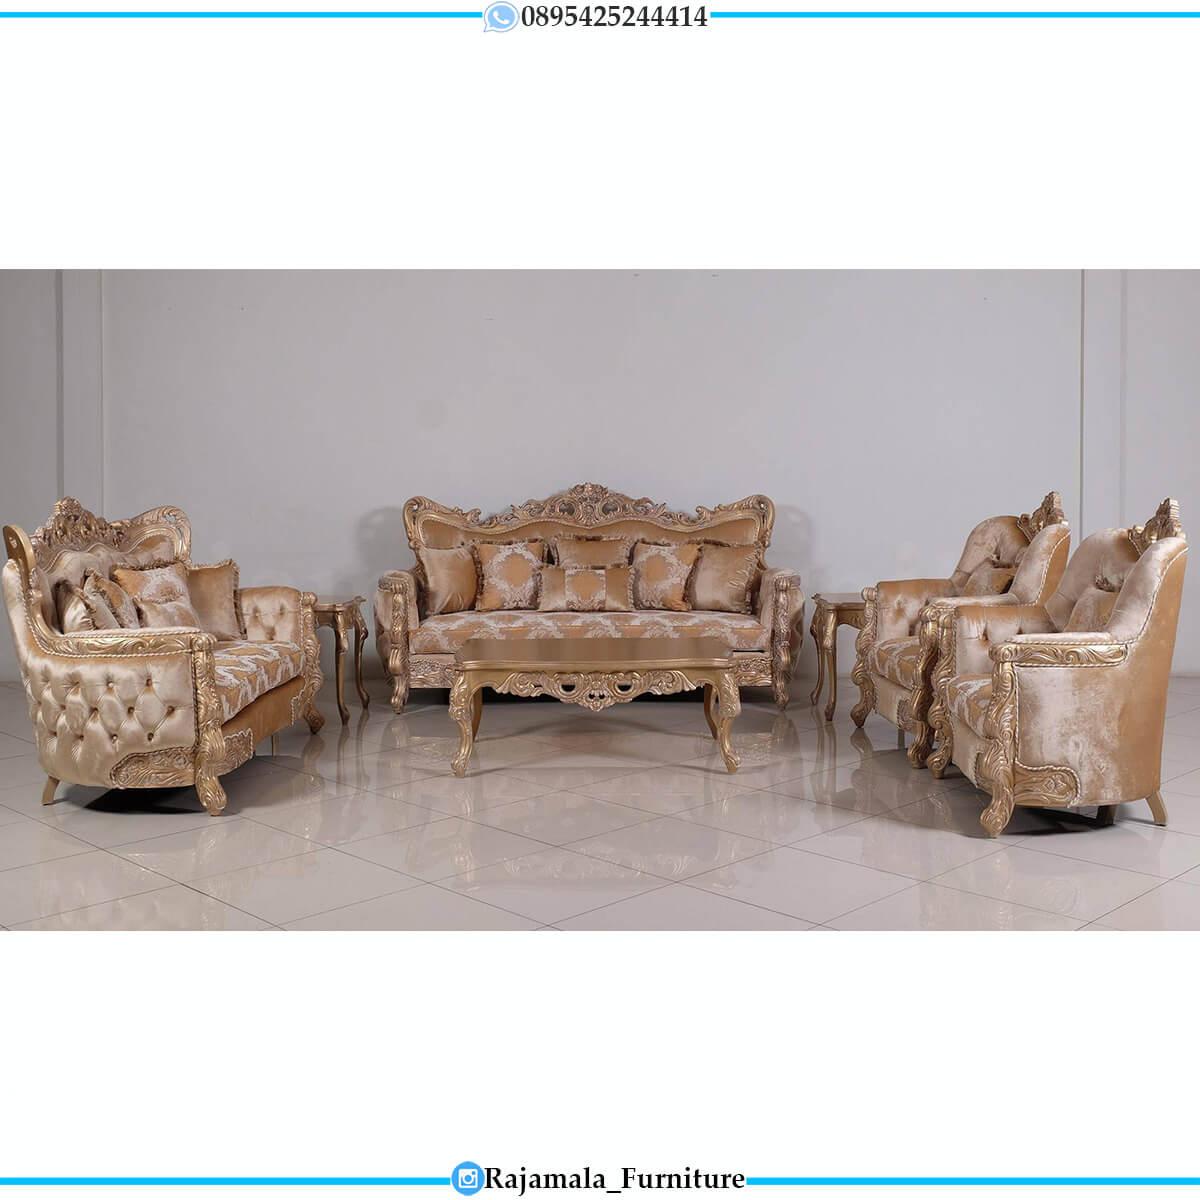 Harga Sofa Tamu Mewah Ukir Jepara Luxurious Imperial Palace RM-0728